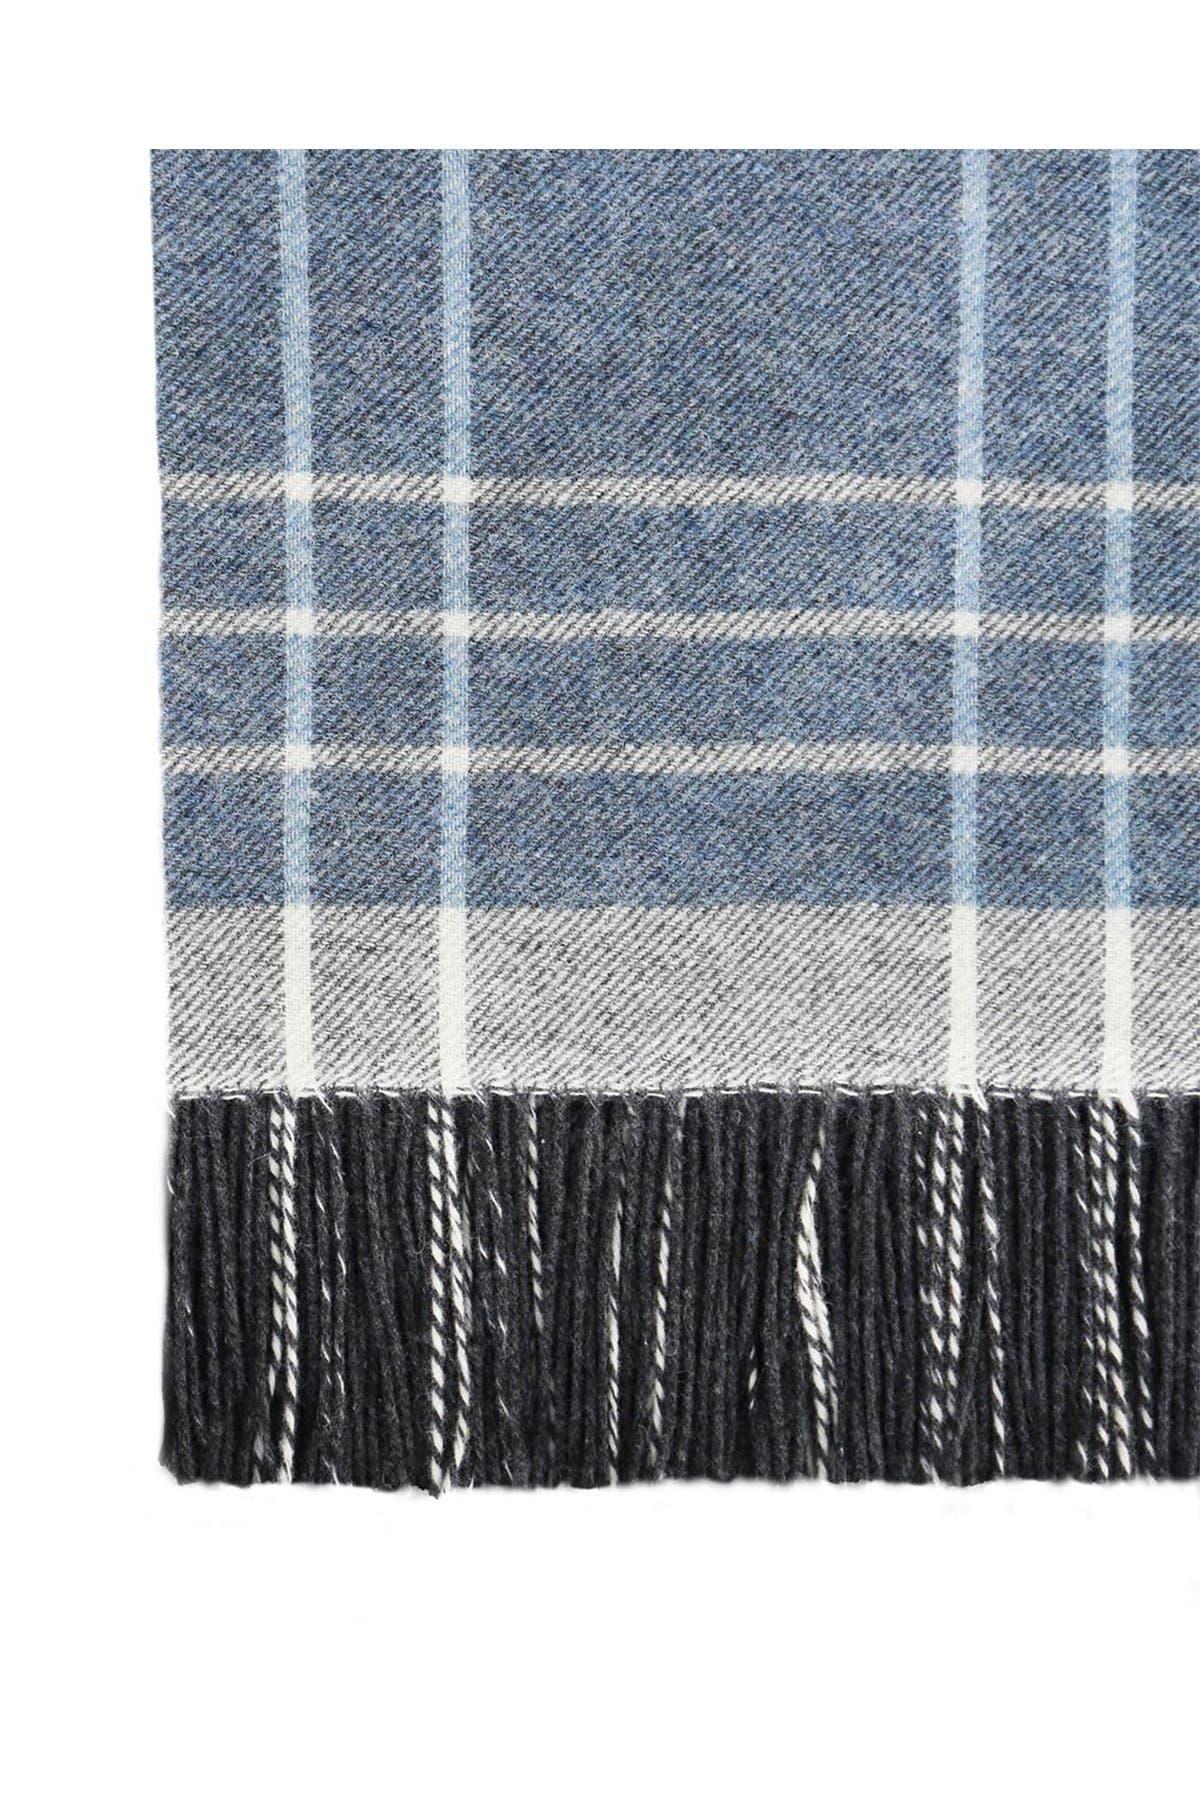 Image of Melange Home Italian Wool Blend Throw - Blue